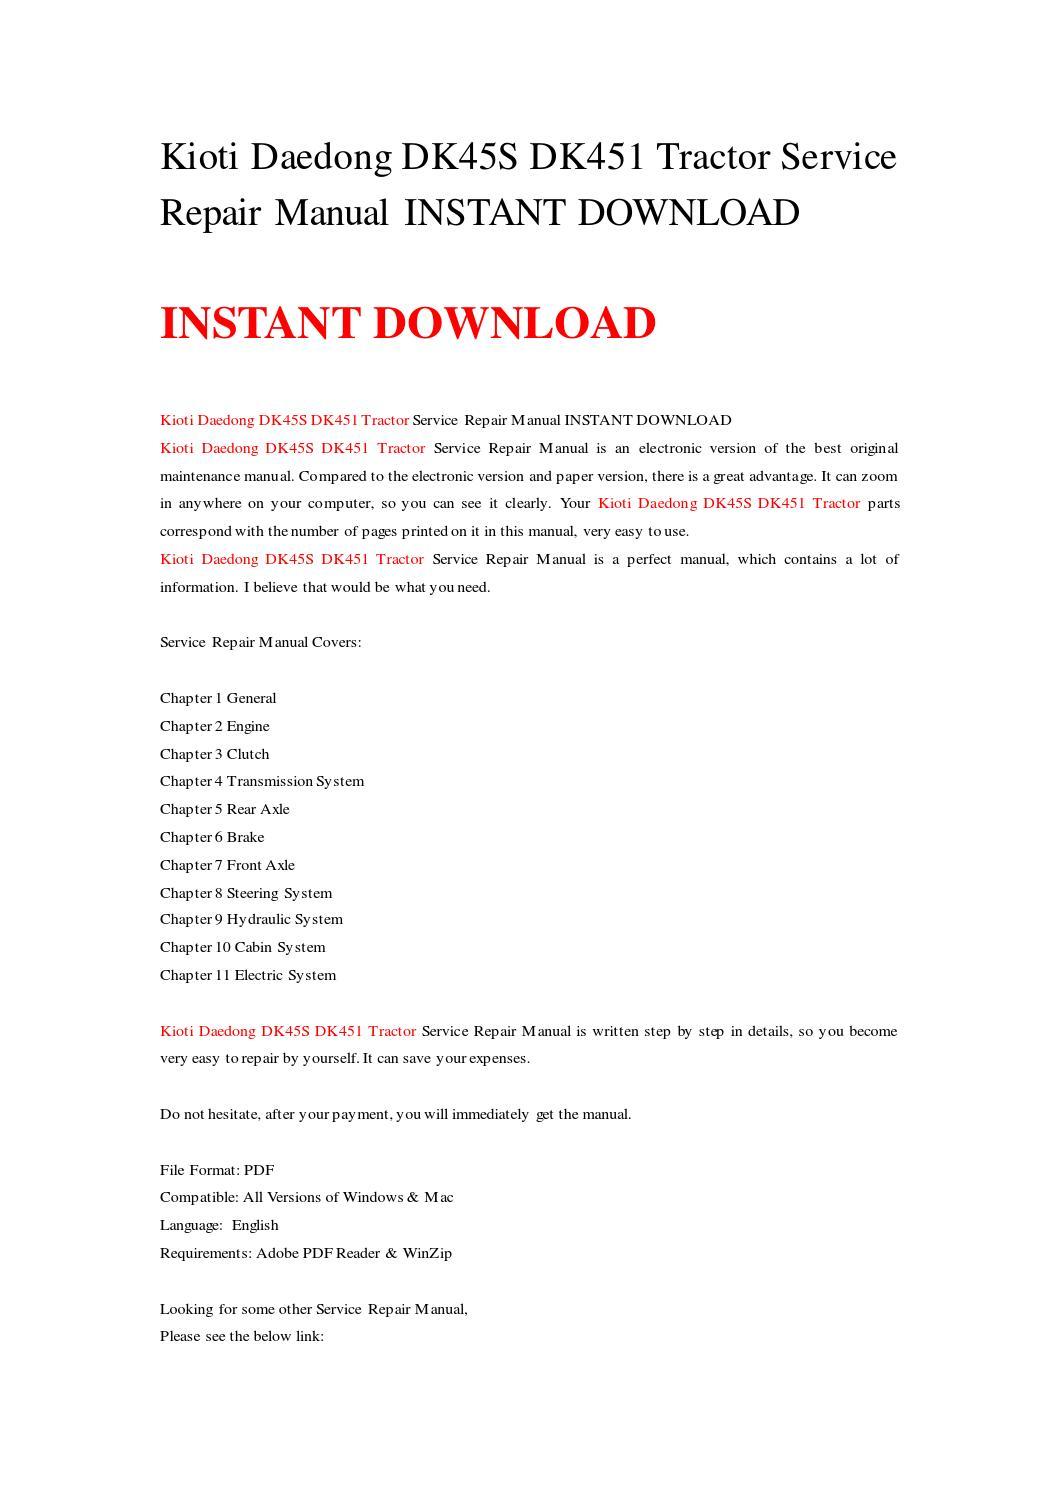 Kioti Ck20 manual